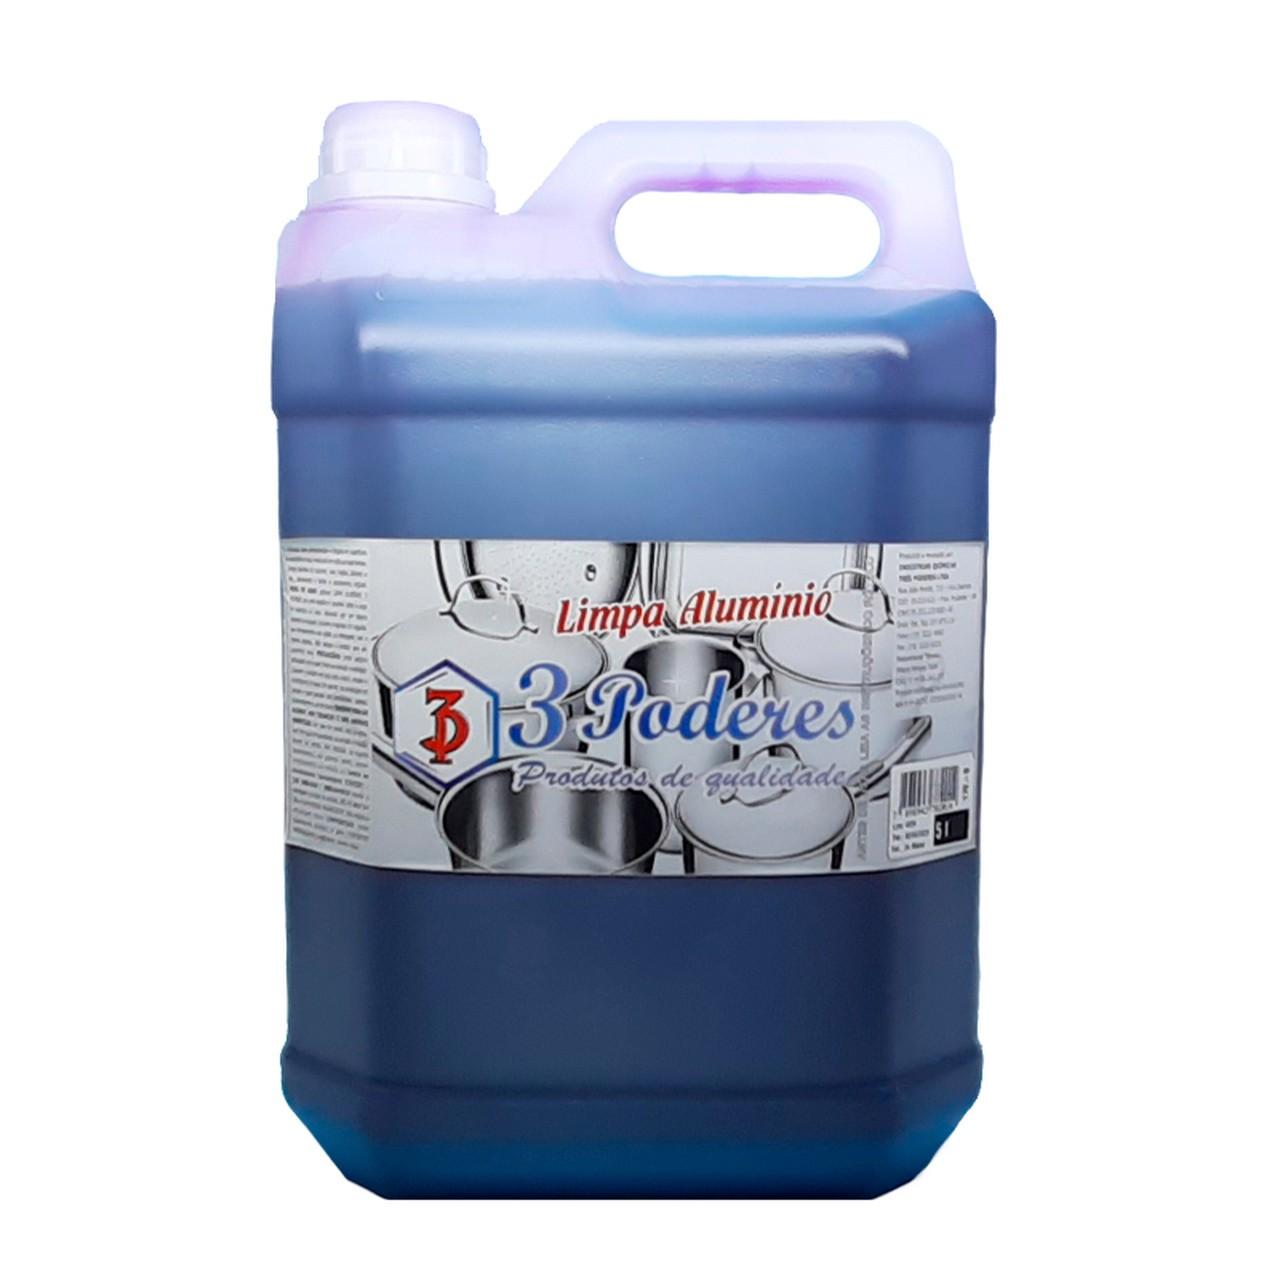 Detergente Limpa Alumínio 3 Poderes 5LTS